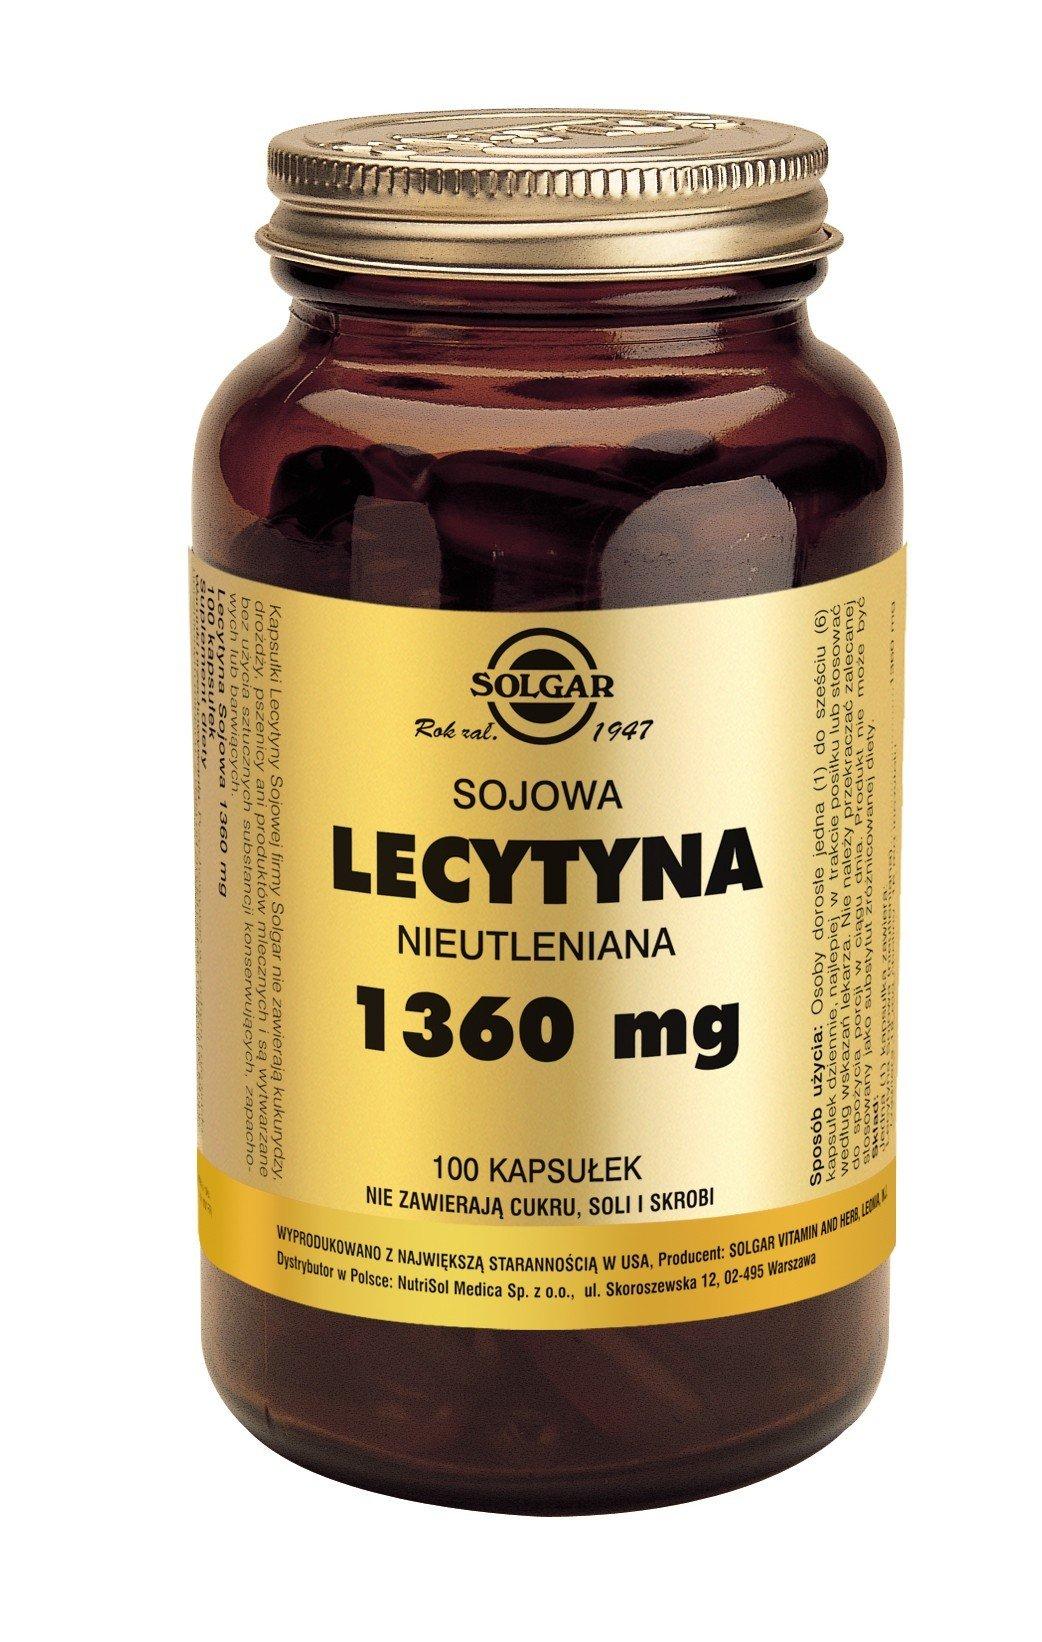 Lecytyna Sojowa Nieutleniania 1360 mg SOLGAR